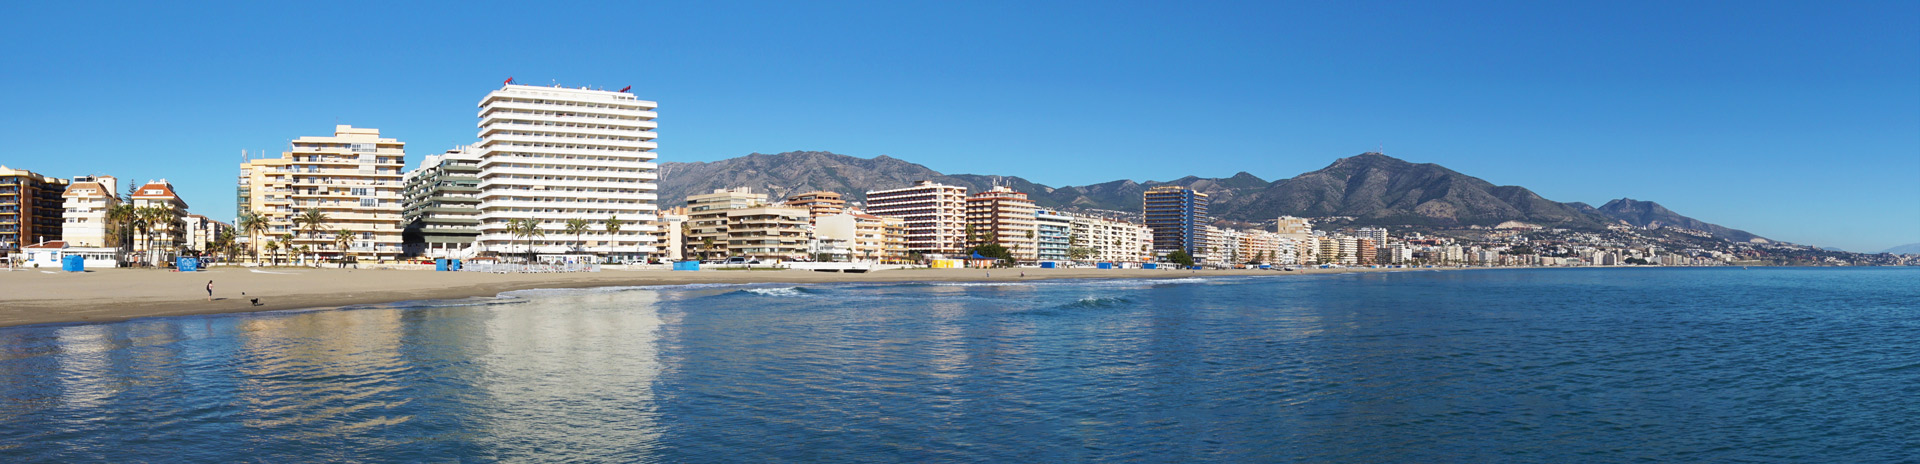 Vivienda en venta Fuengirola